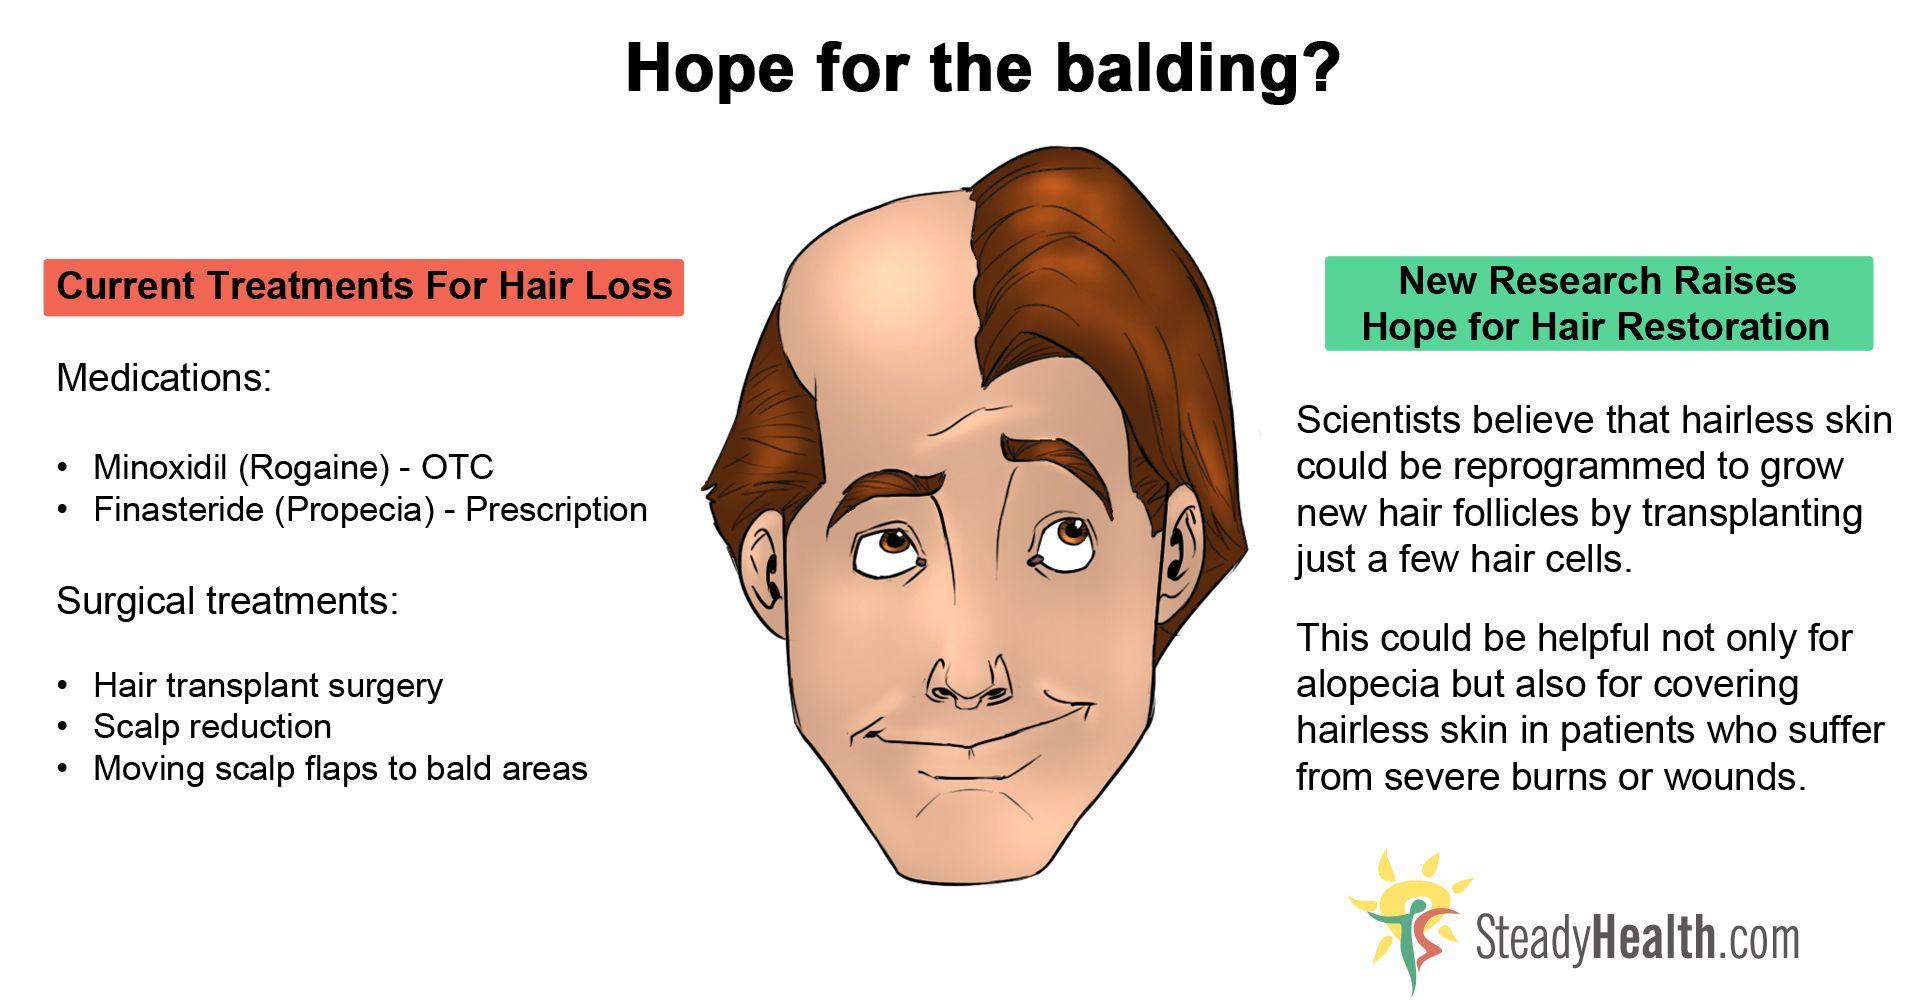 Masturbation and baldness